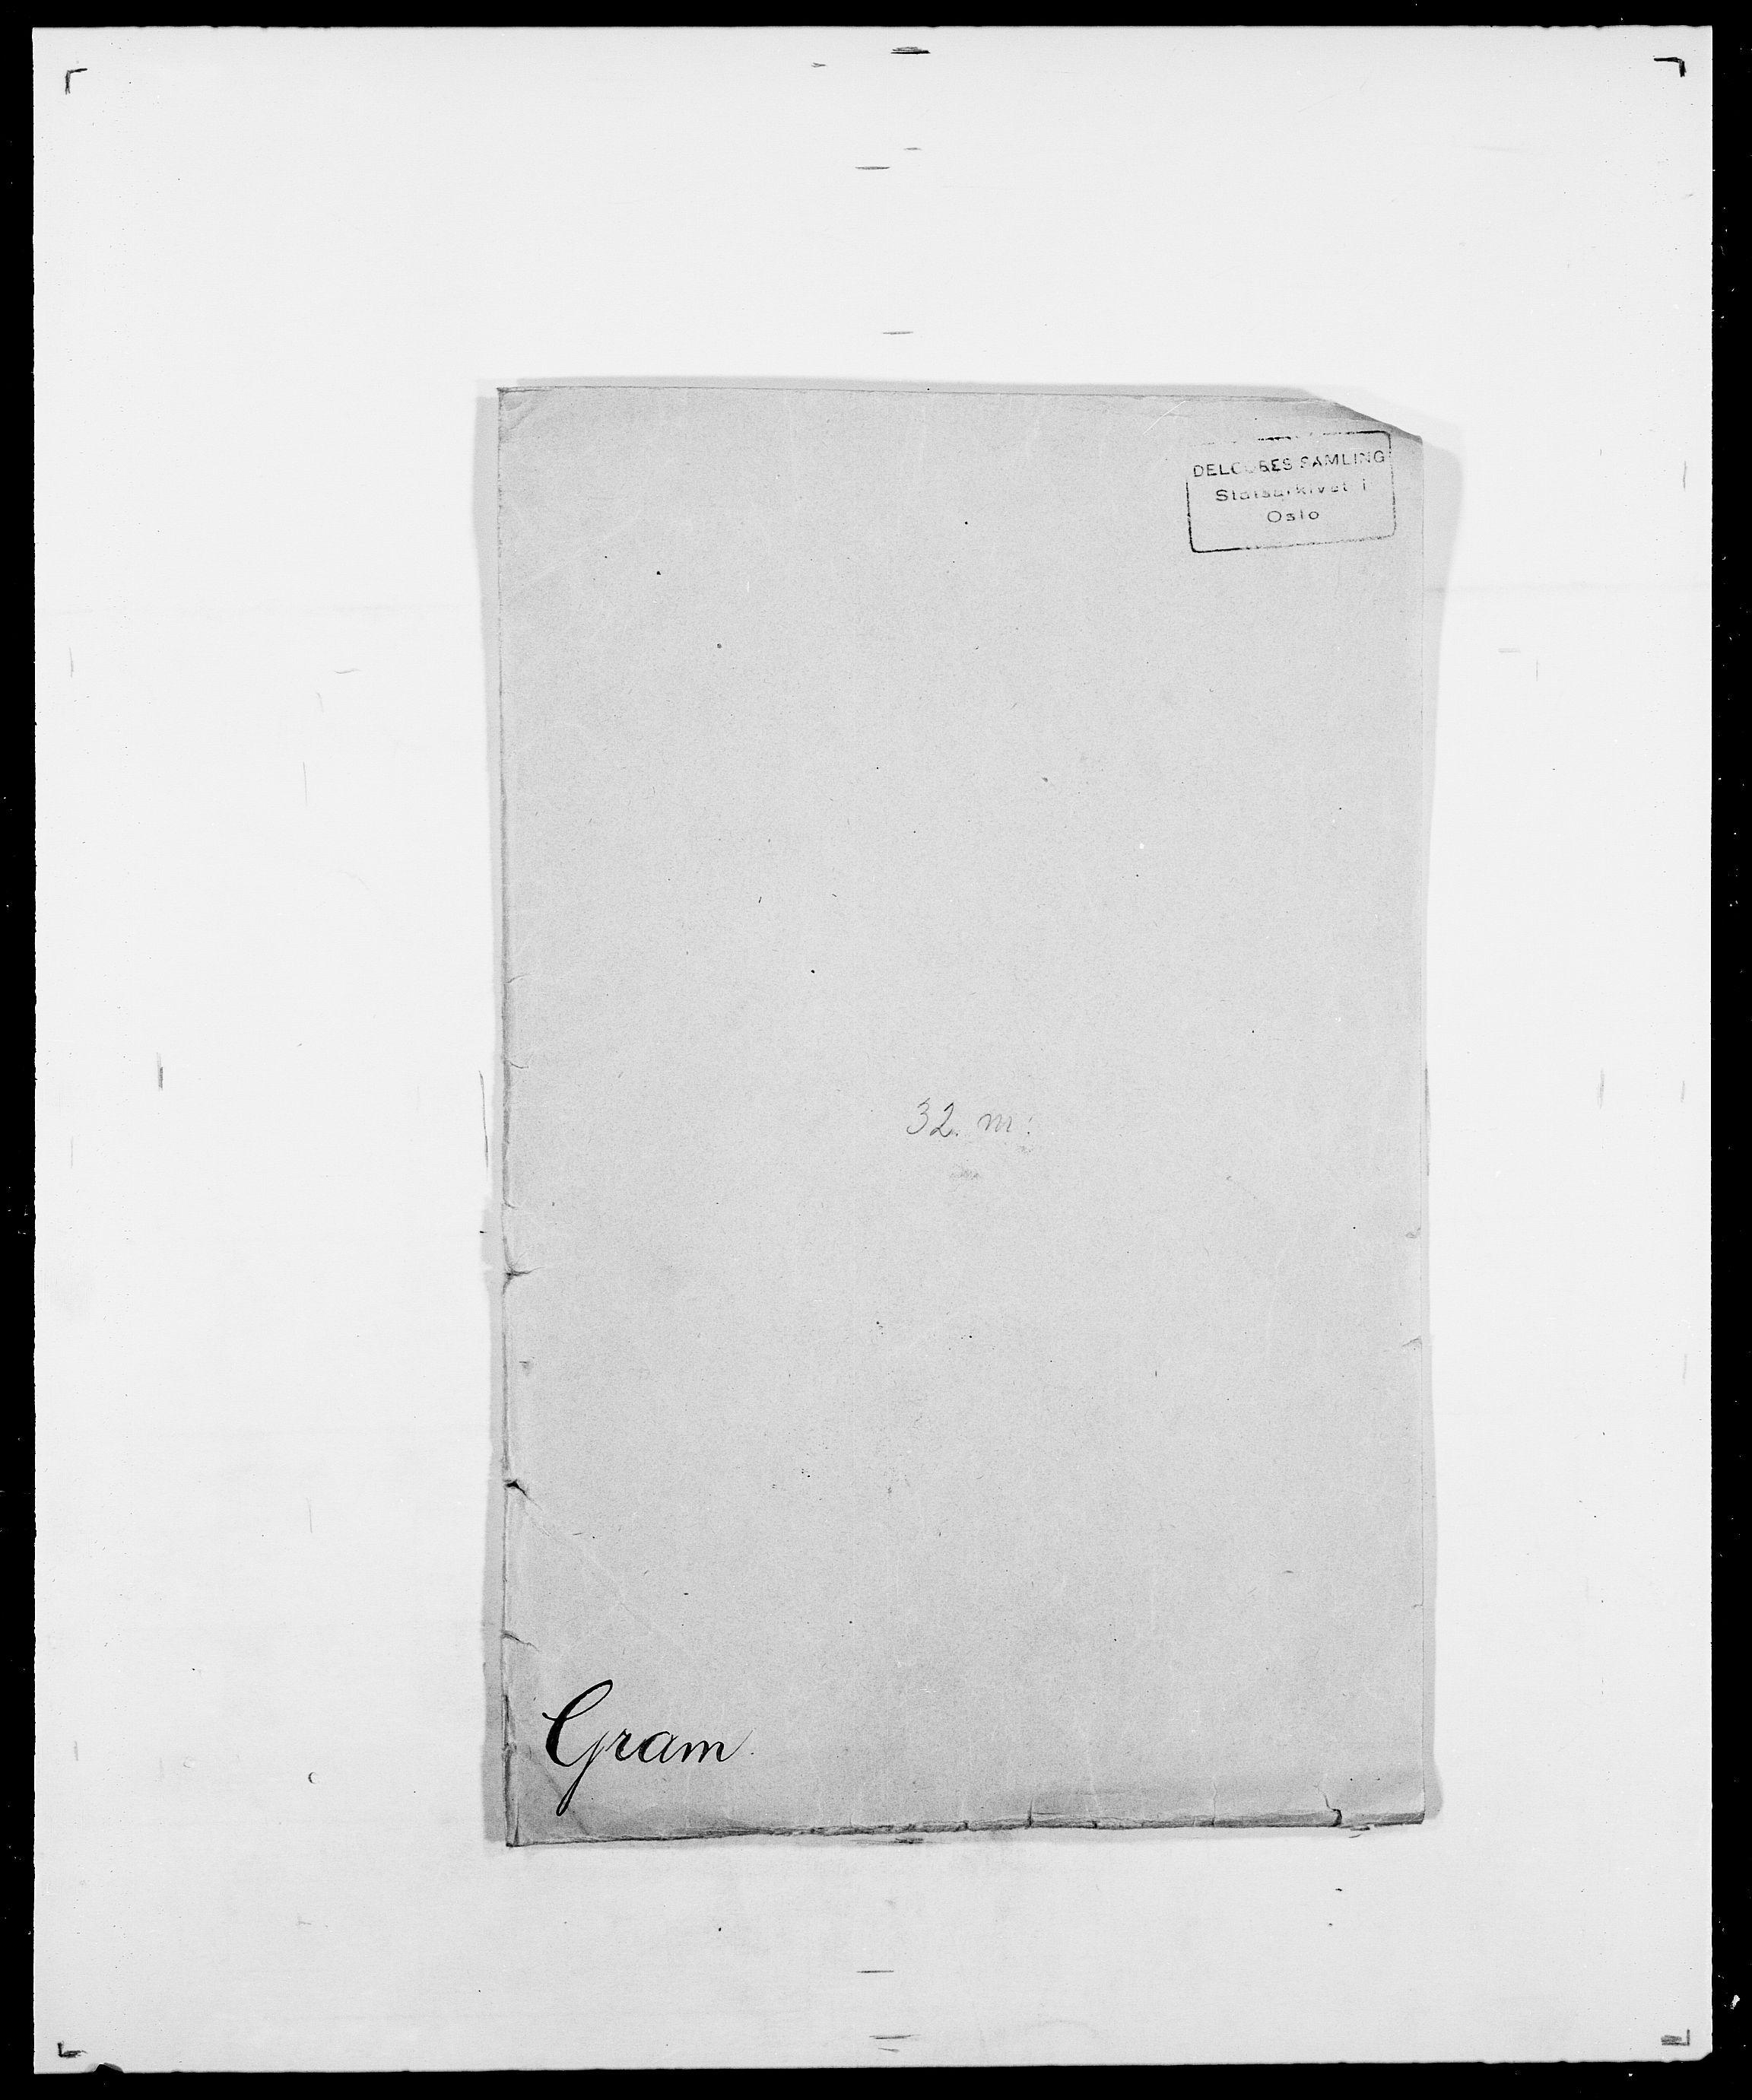 SAO, Delgobe, Charles Antoine - samling, D/Da/L0014: Giebdhausen - Grip, s. 470